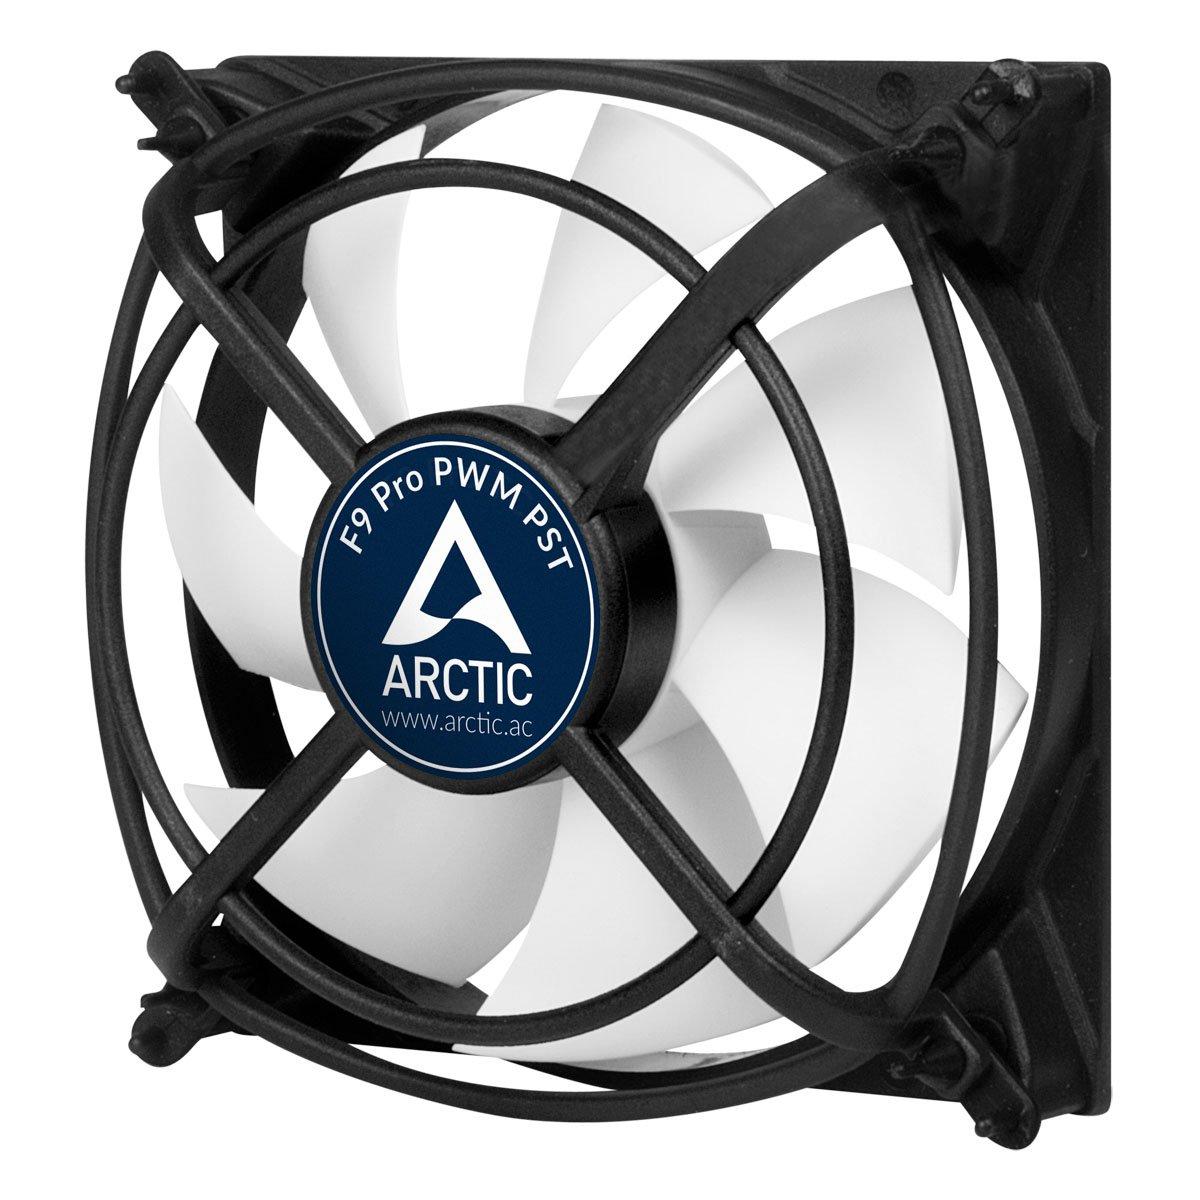 ARCTIC F9-92 mm Standard Gehä uselü fter| Extrem leiser Lü fter | Case Fan mit Standardgehä use | Push- oder Pull Konfiguration mö glich AFACO-09000-GBA01 Gehäuse Lüfter